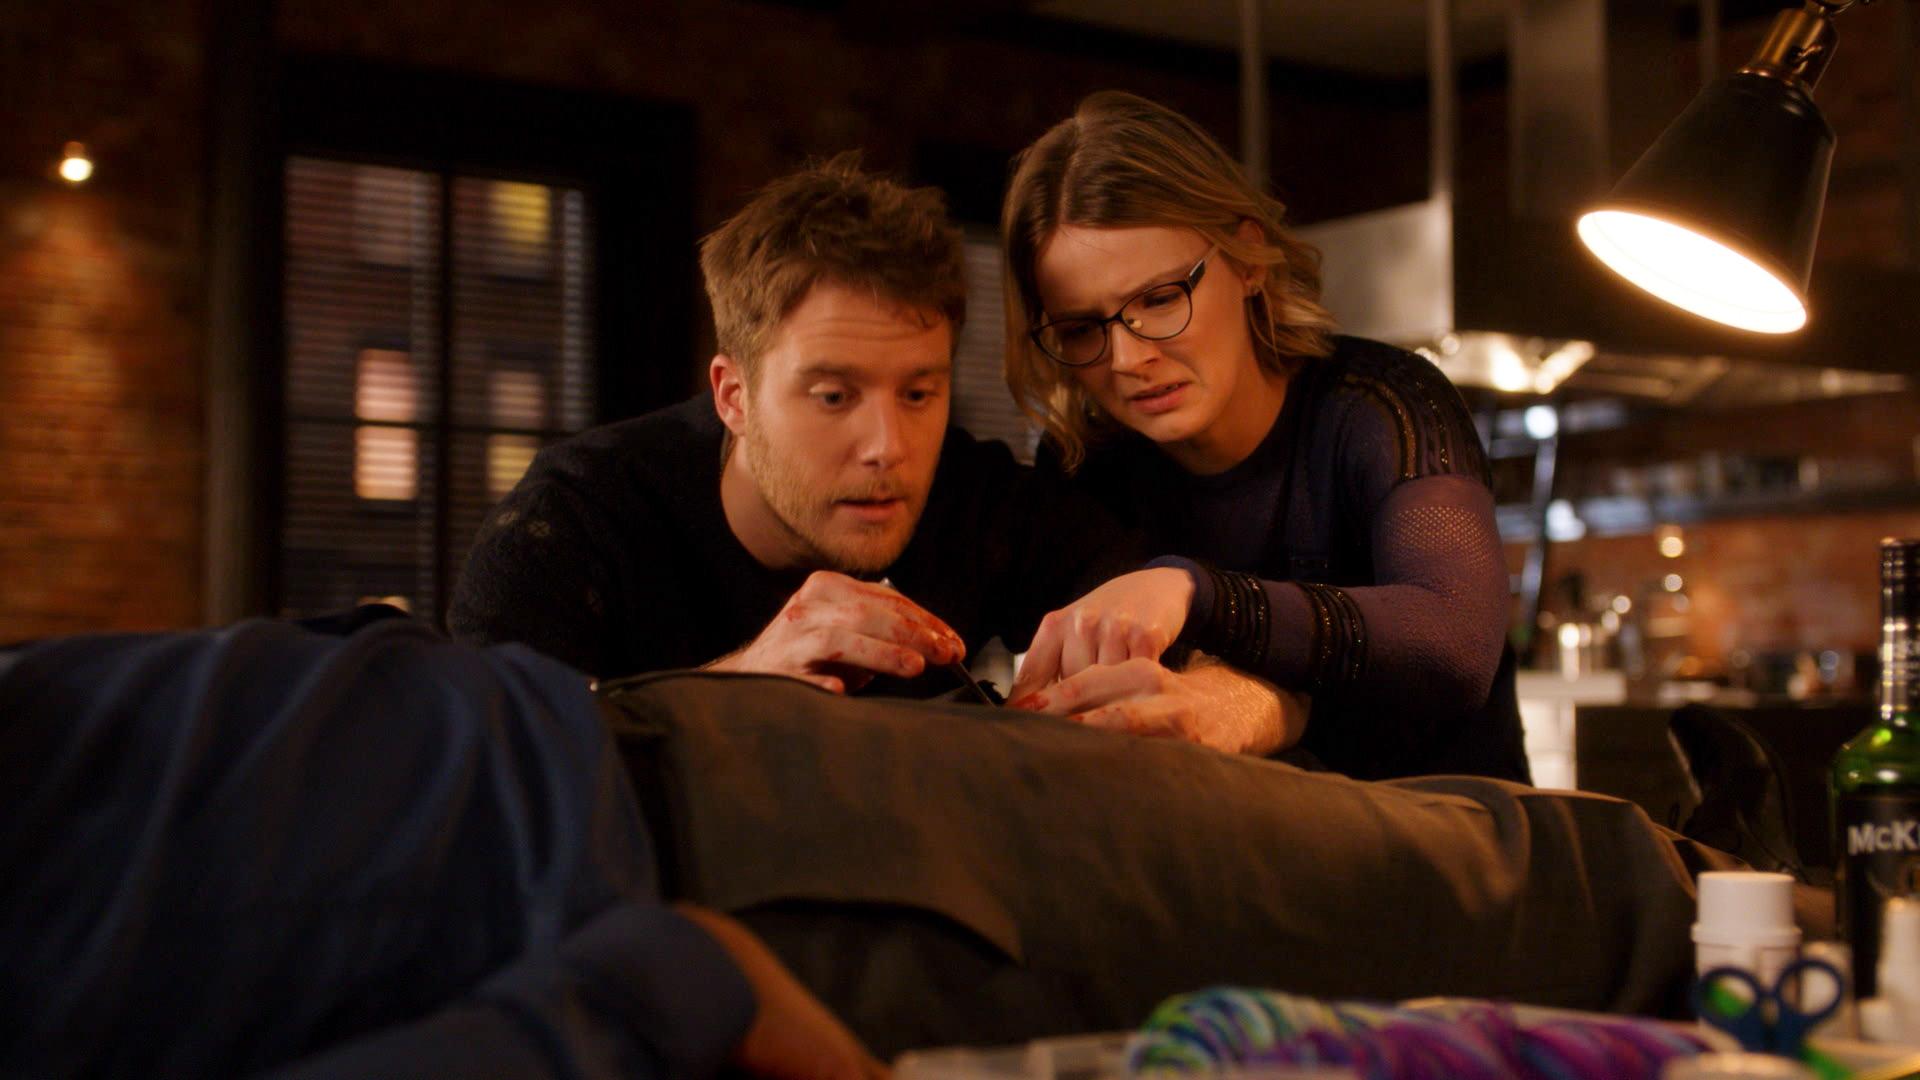 Jake McDorman as Brian Finch and Megan Guinan as Rachel Finch